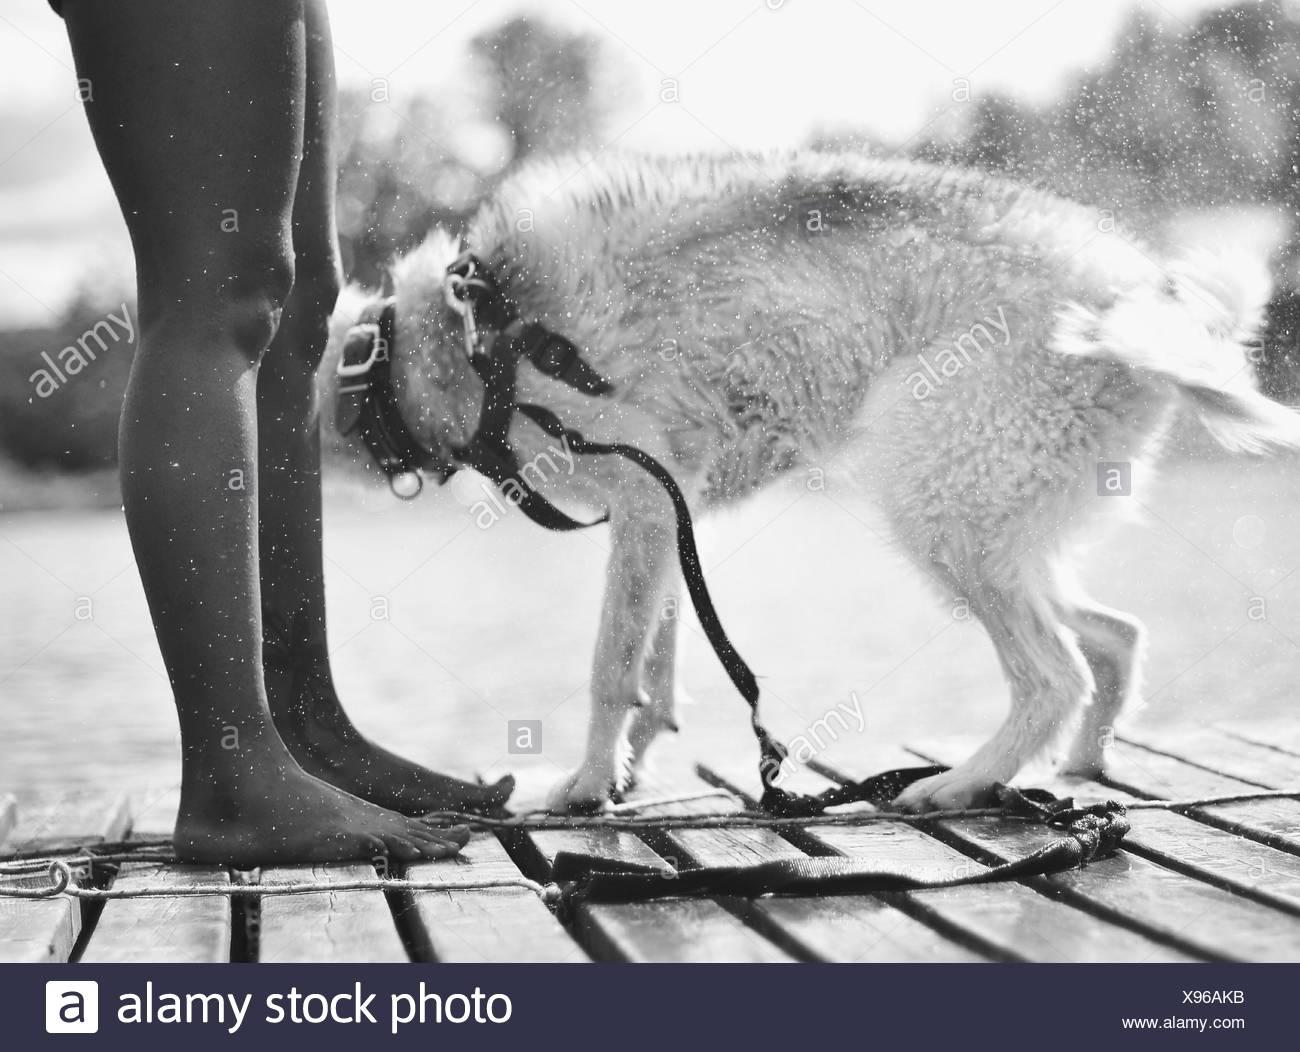 Hund schütteln auf Pier Stockbild